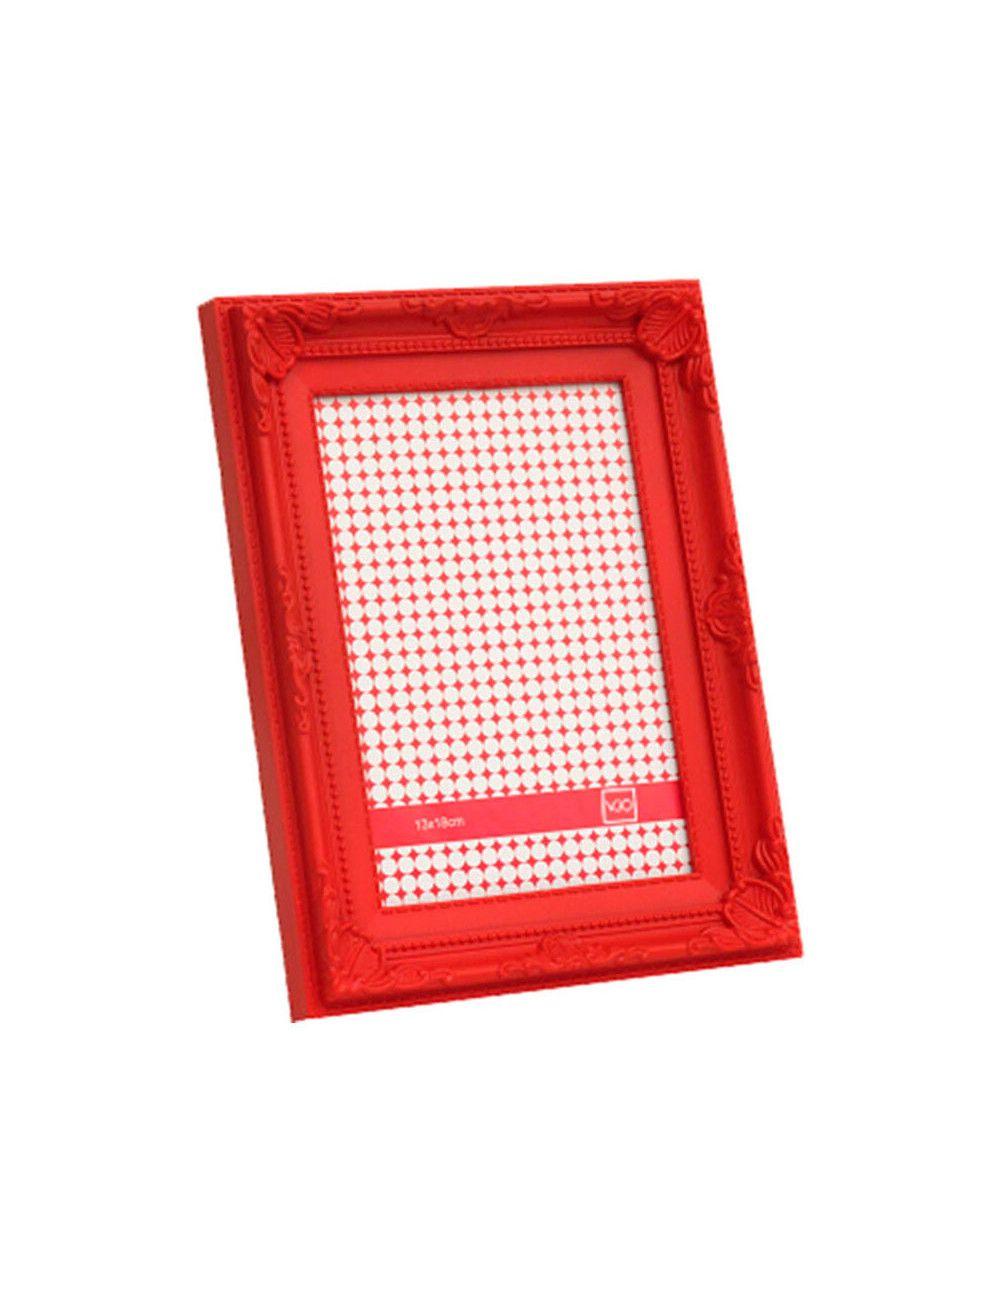 LightBox Mini - Con Luz Led - 22X24cm